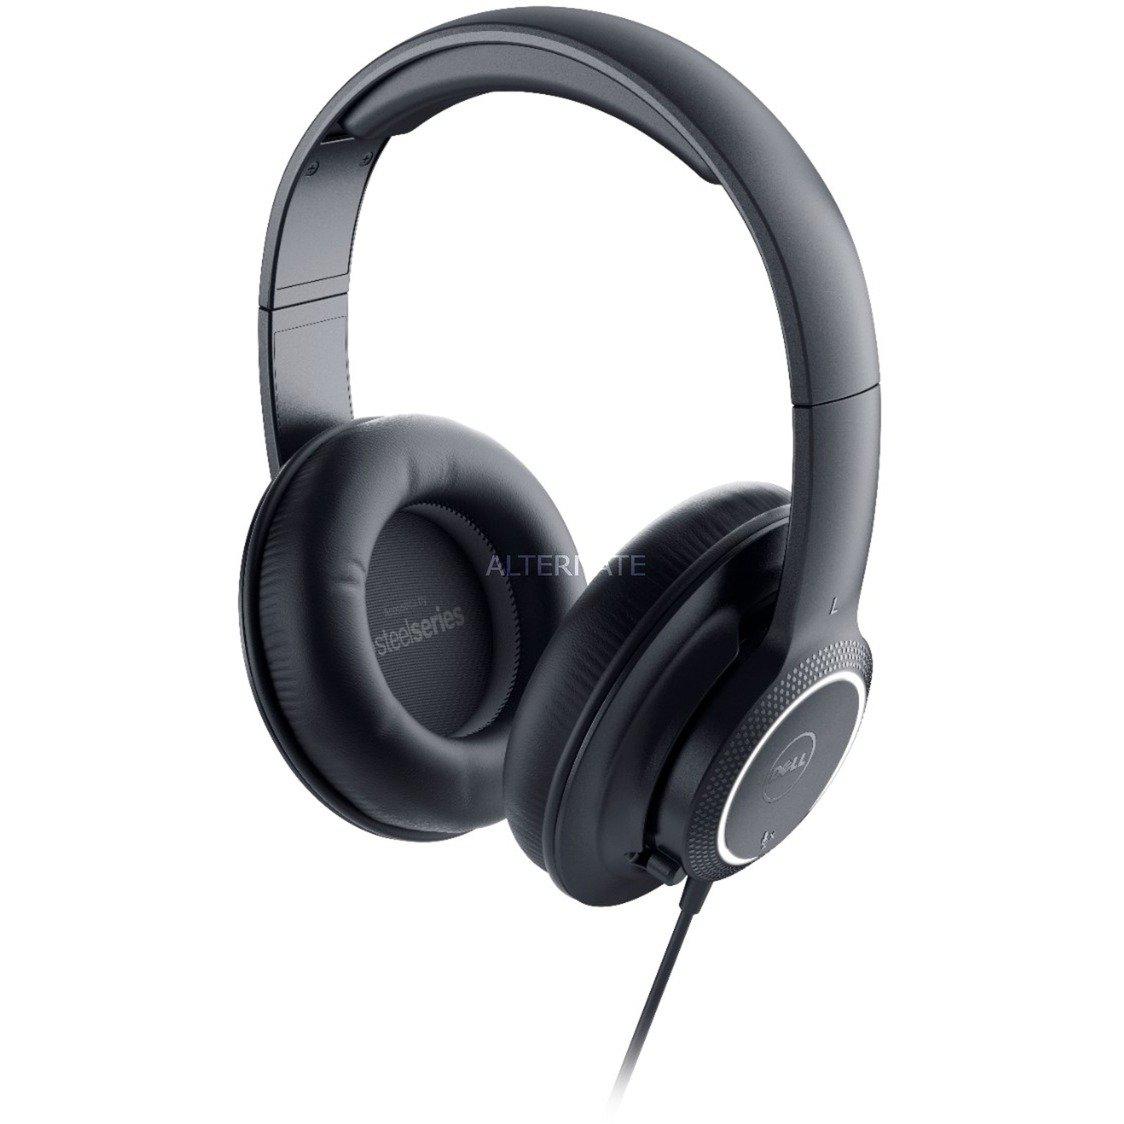 520-AAKK auricular con micrófono Binaural Diadema Negro, Auriculares con micrófono